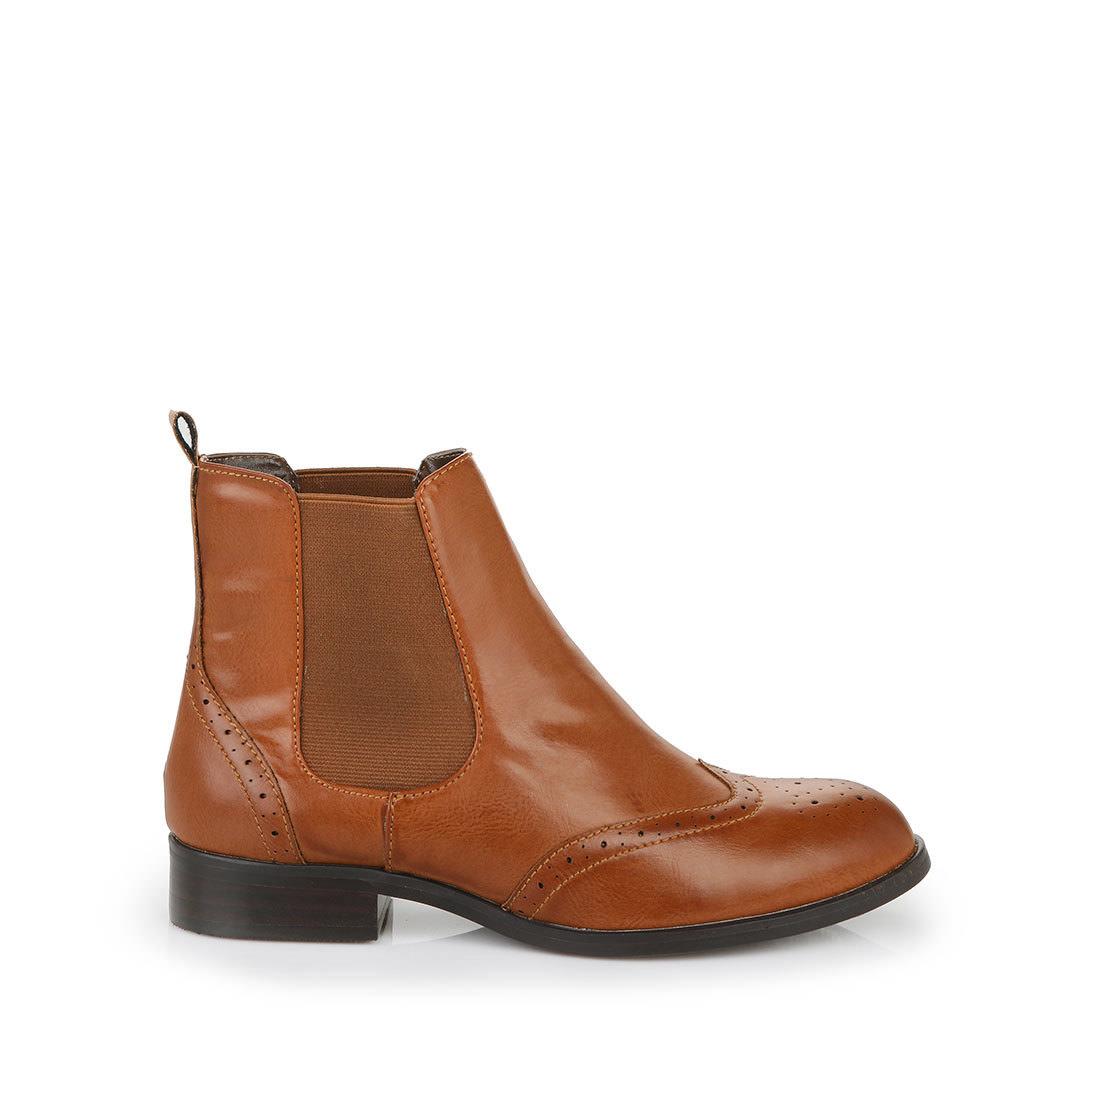 buffalo chelsea boots in cognac buy online in buffalo online shop buffalo. Black Bedroom Furniture Sets. Home Design Ideas